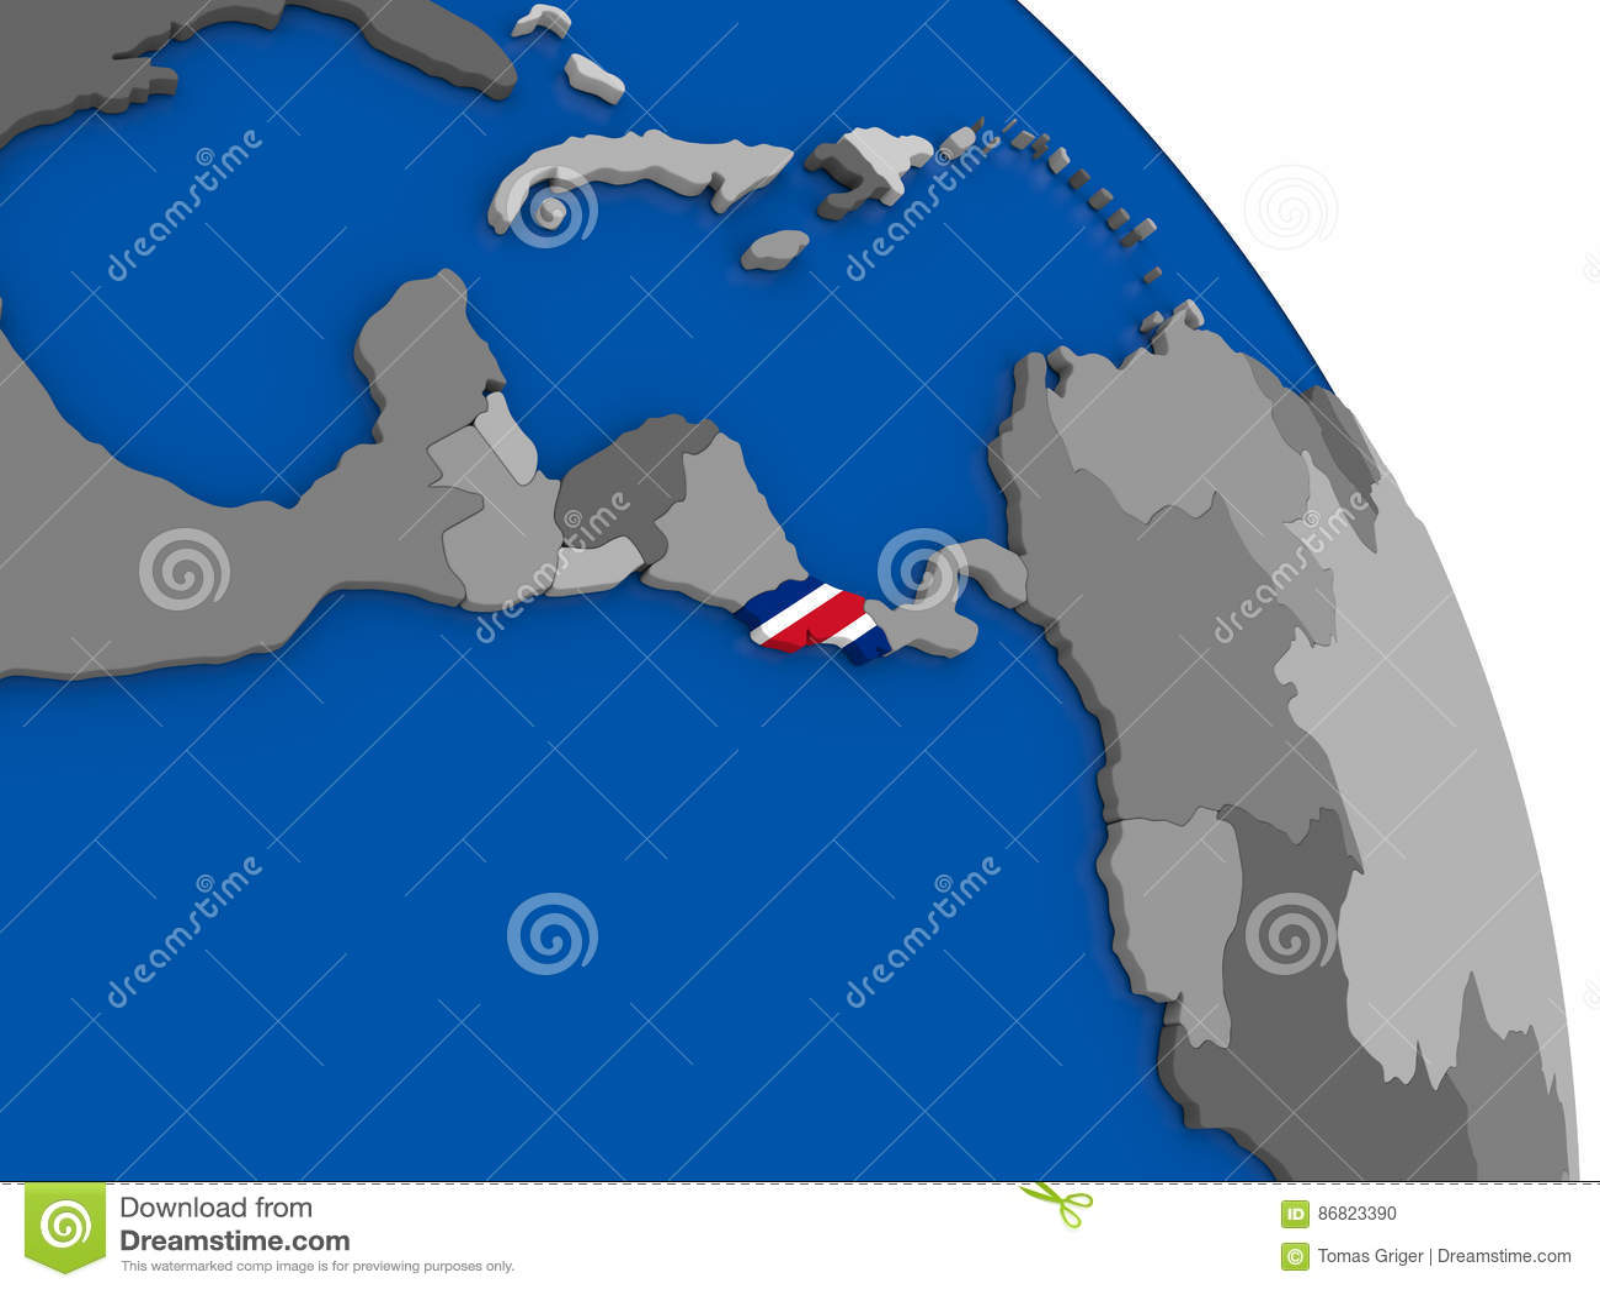 Costa Rica And Its Flag On Globe Stock Illustration - Illustration ...